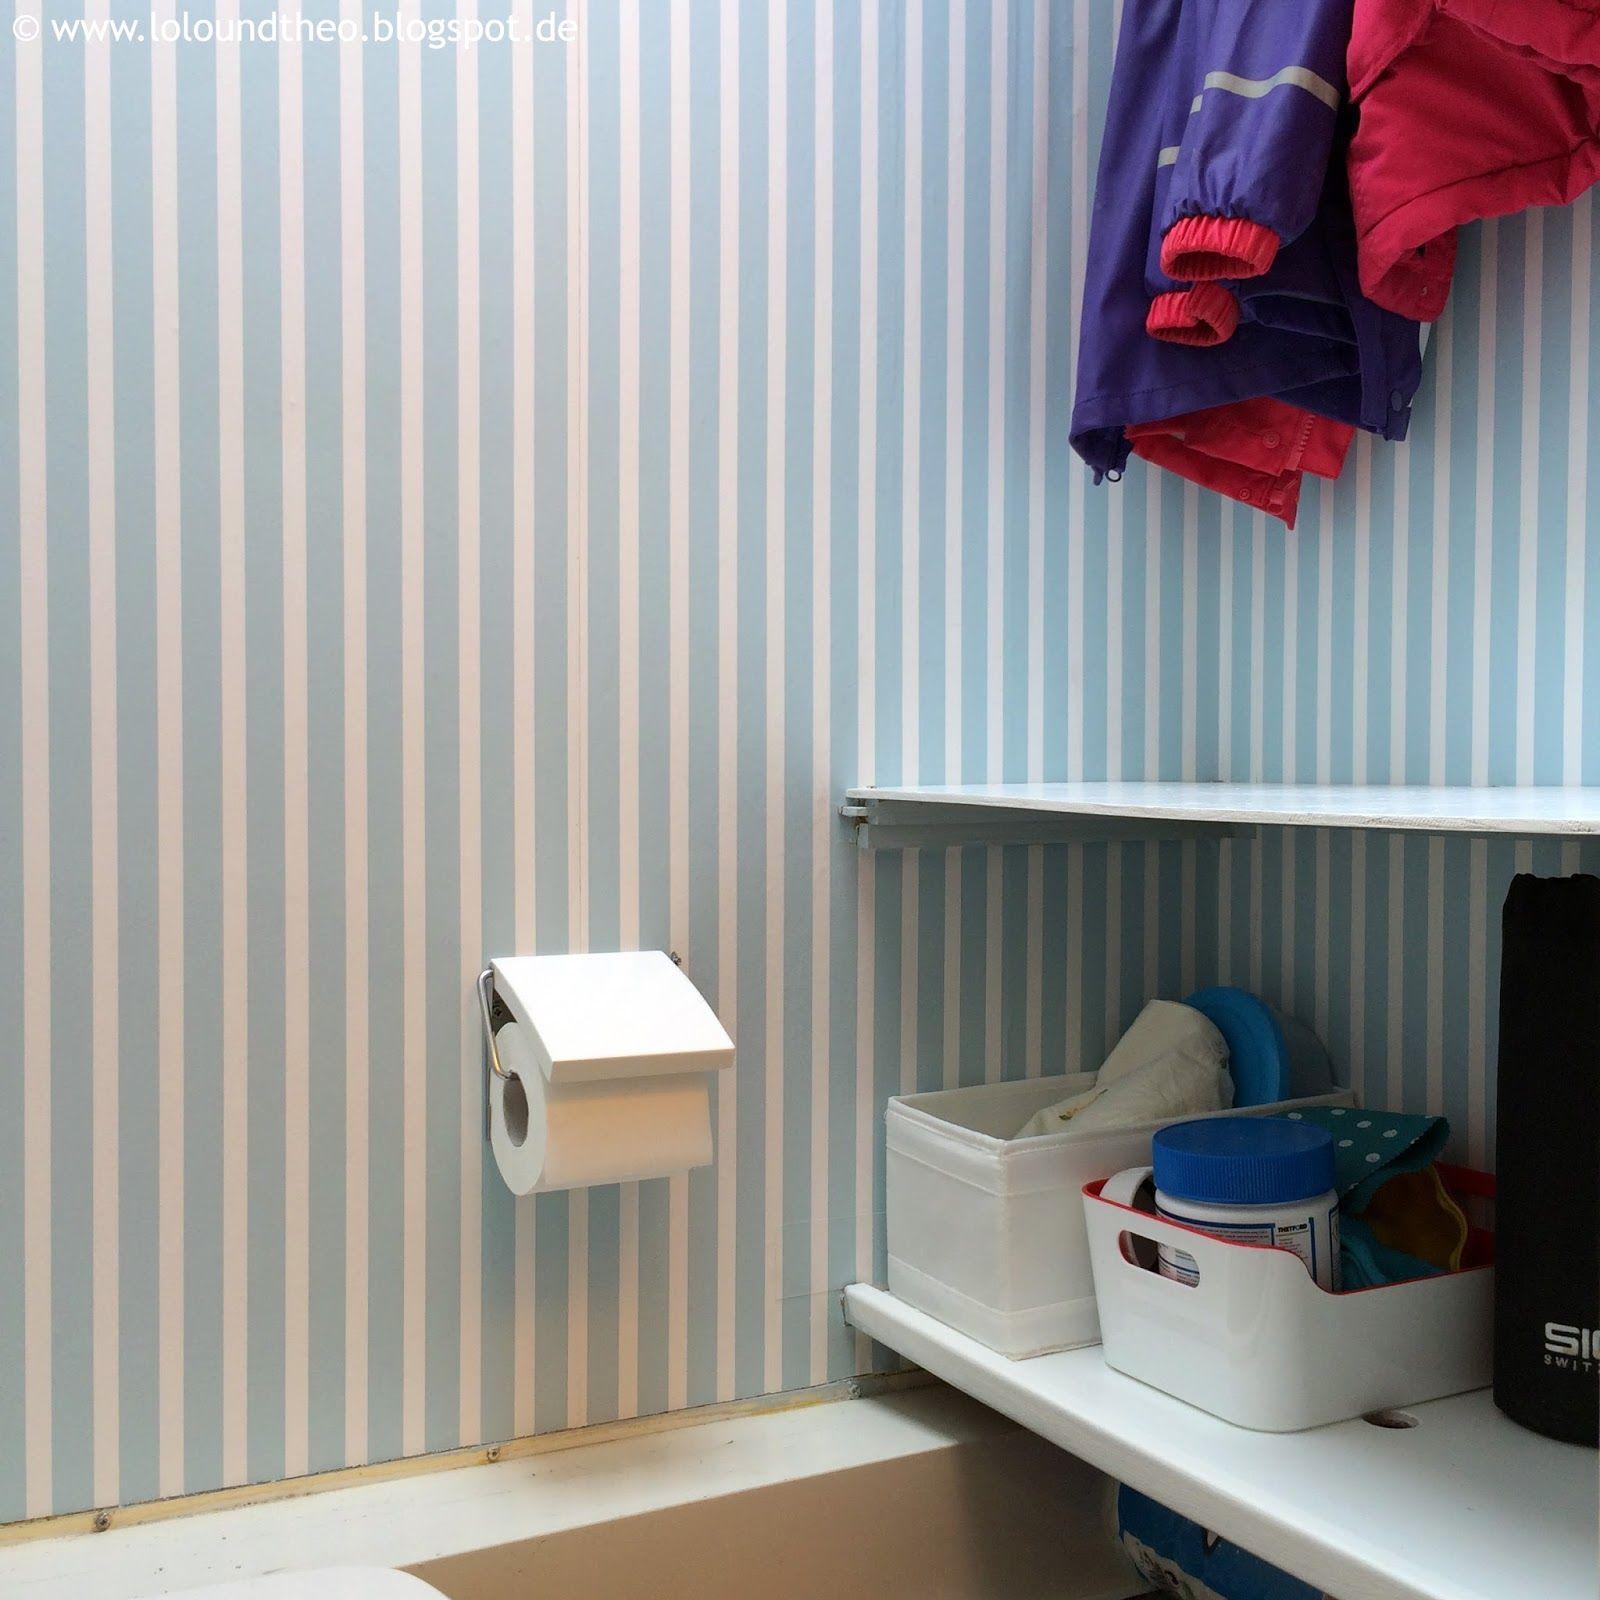 nasszelle toilettenraum unseres wohnwagens knaus. Black Bedroom Furniture Sets. Home Design Ideas